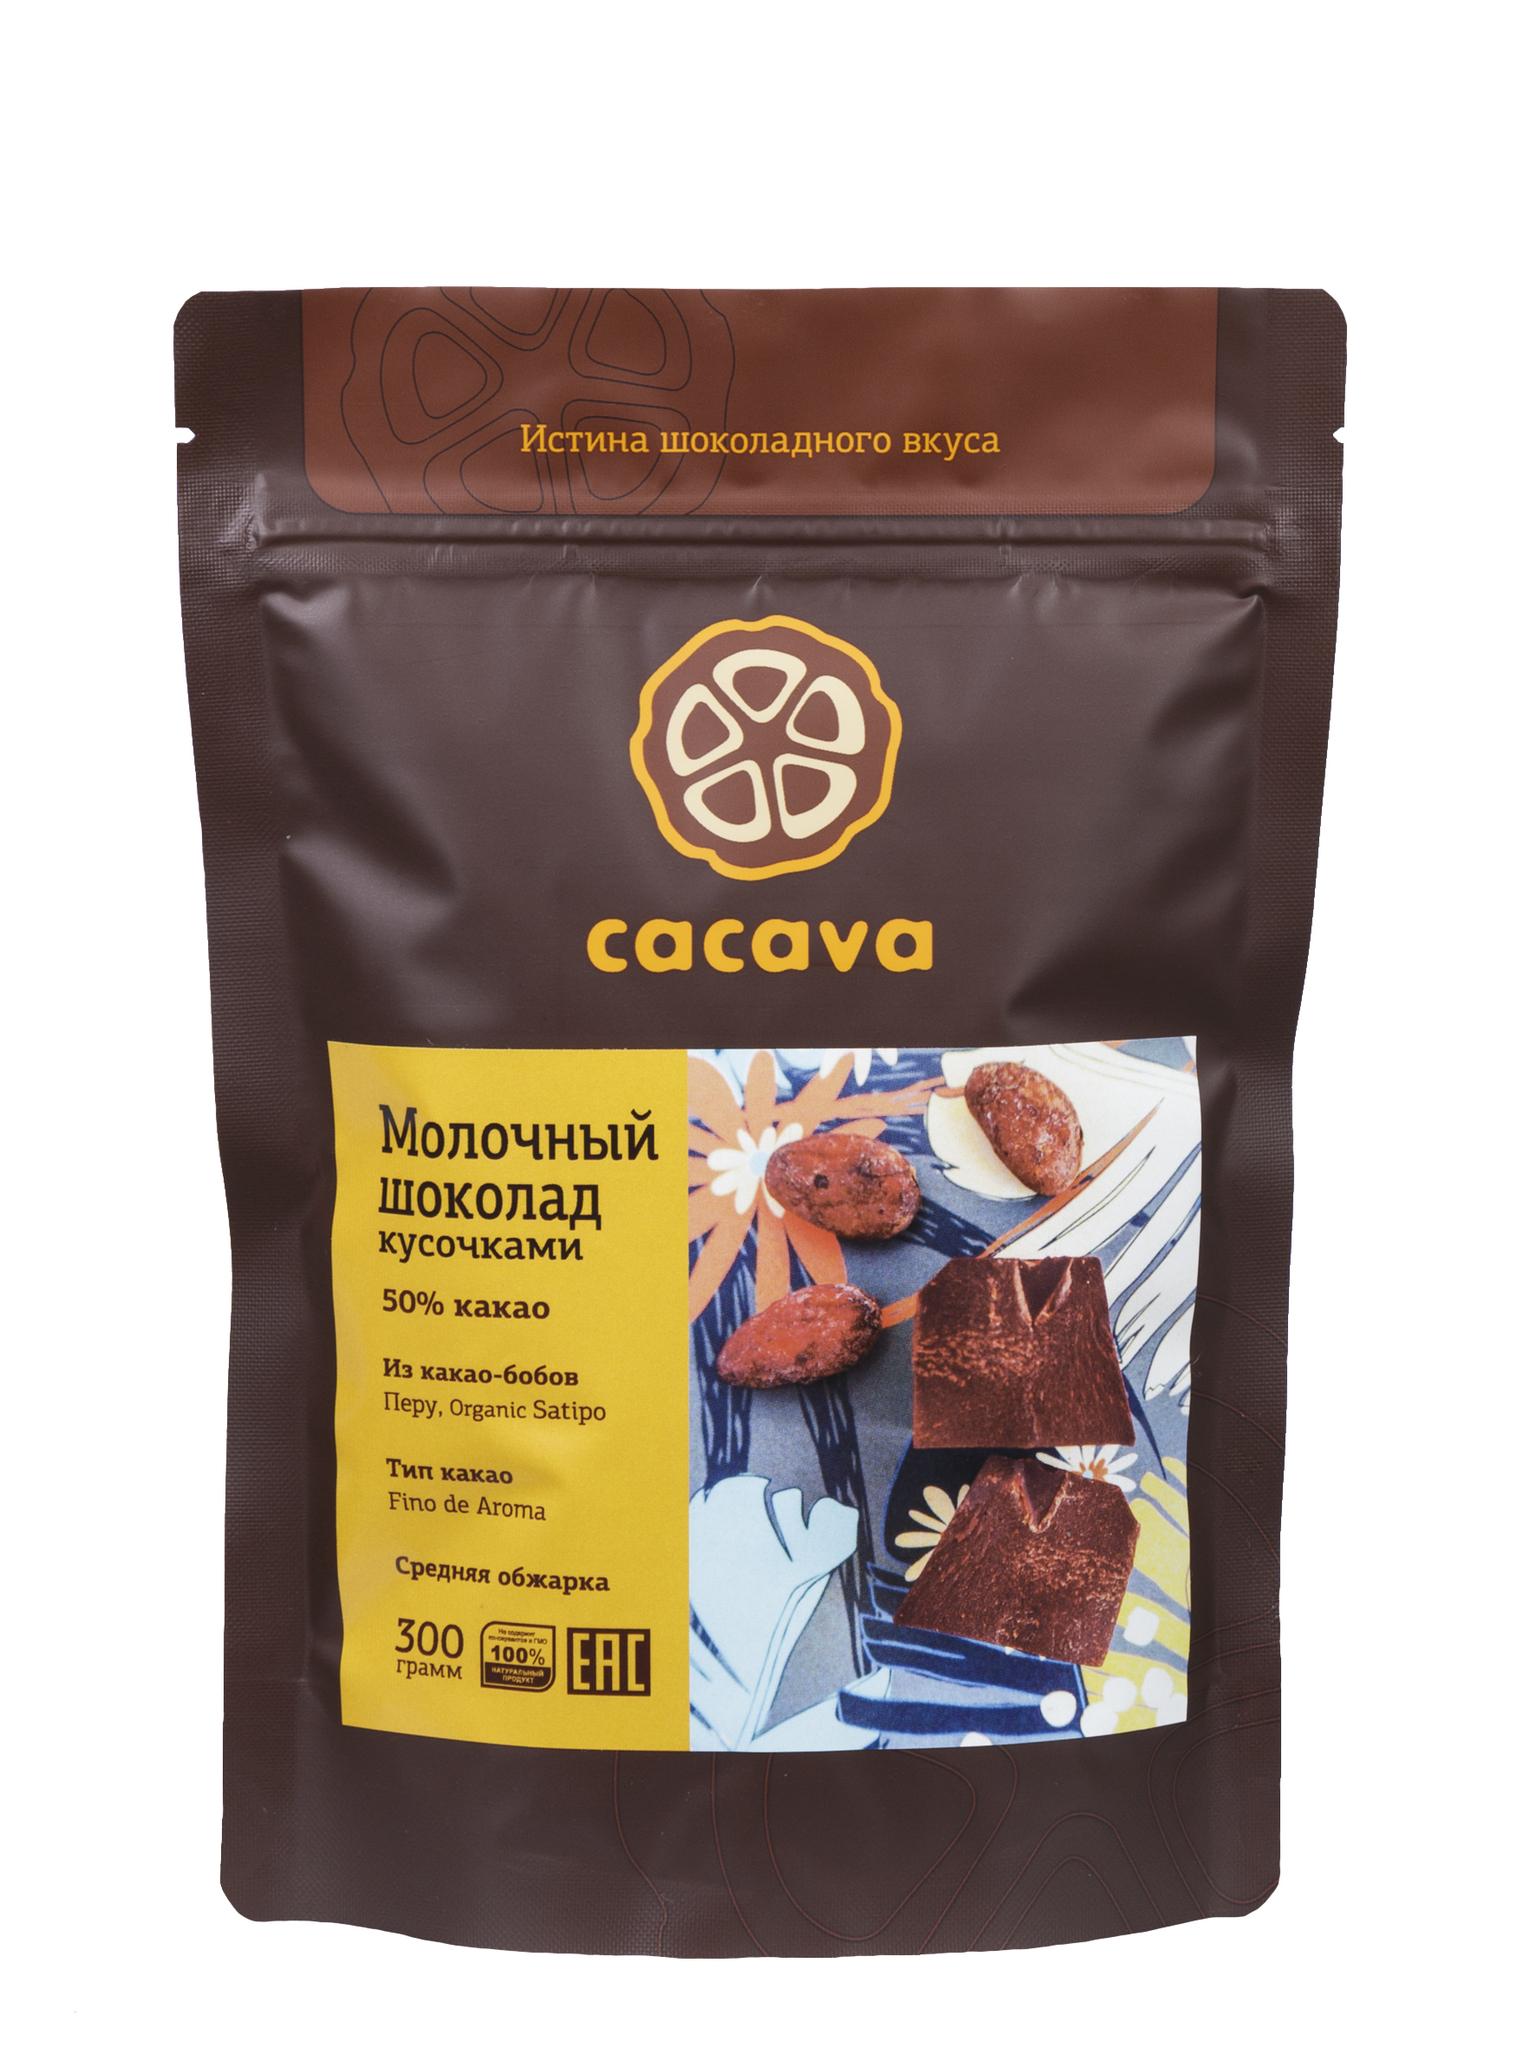 Молочный шоколад 50 % какао (Перу), упаковка 300 грамм